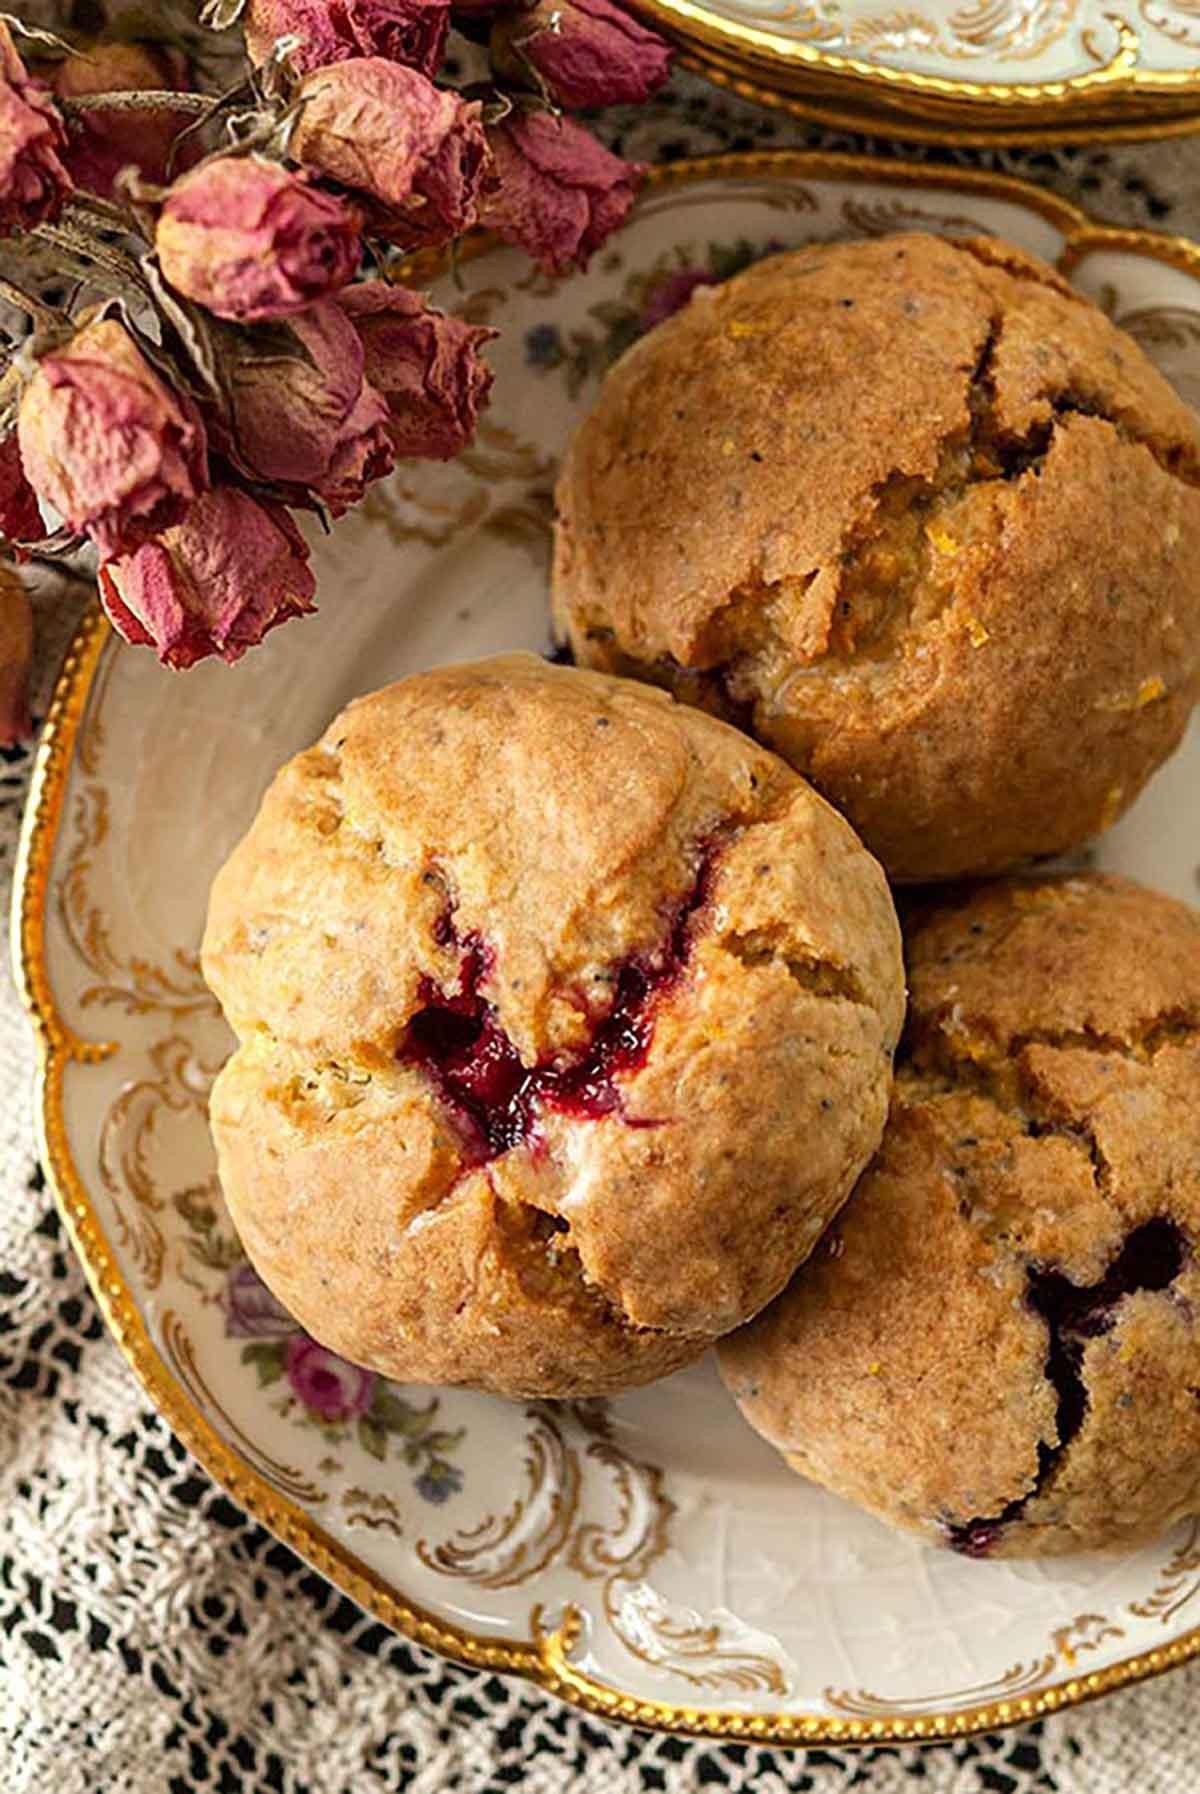 3 lemon-raspberry scones on an antique plate, beside a few dry, pink spray roses.